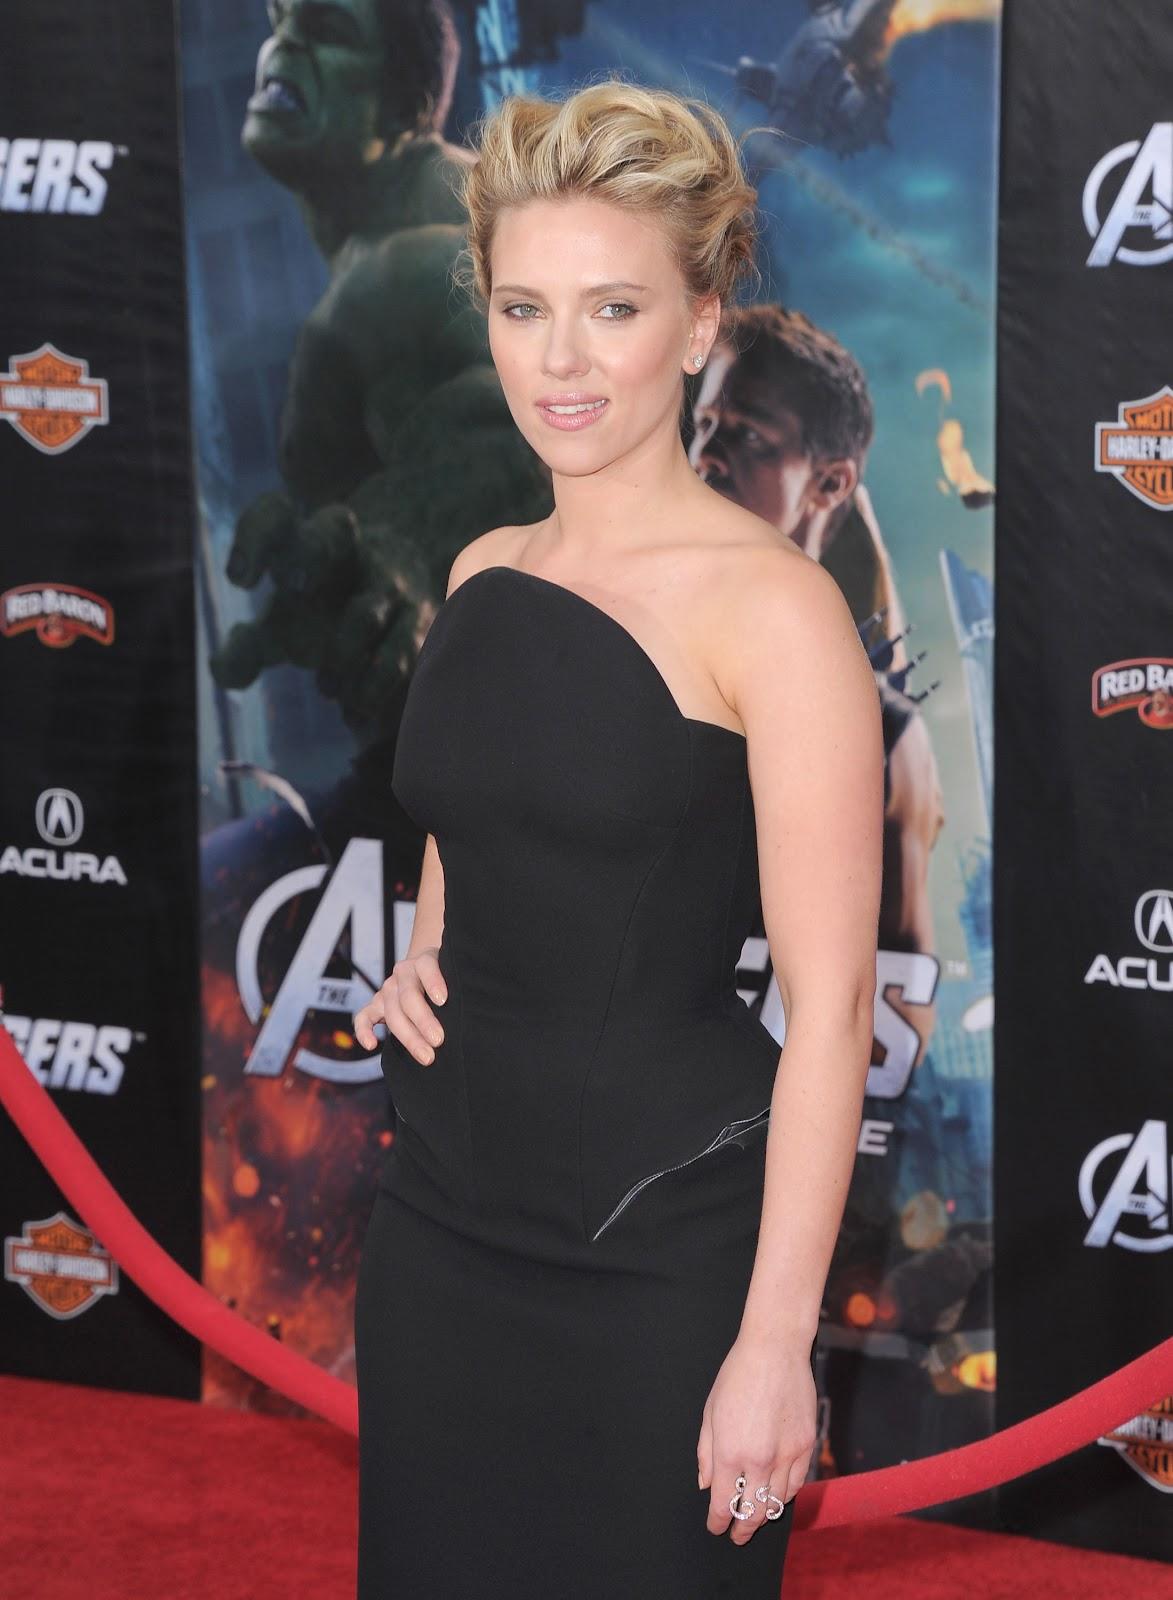 Scarlett johansson pictures gallery 31 film actresses - Scarlett johansson blogspot ...